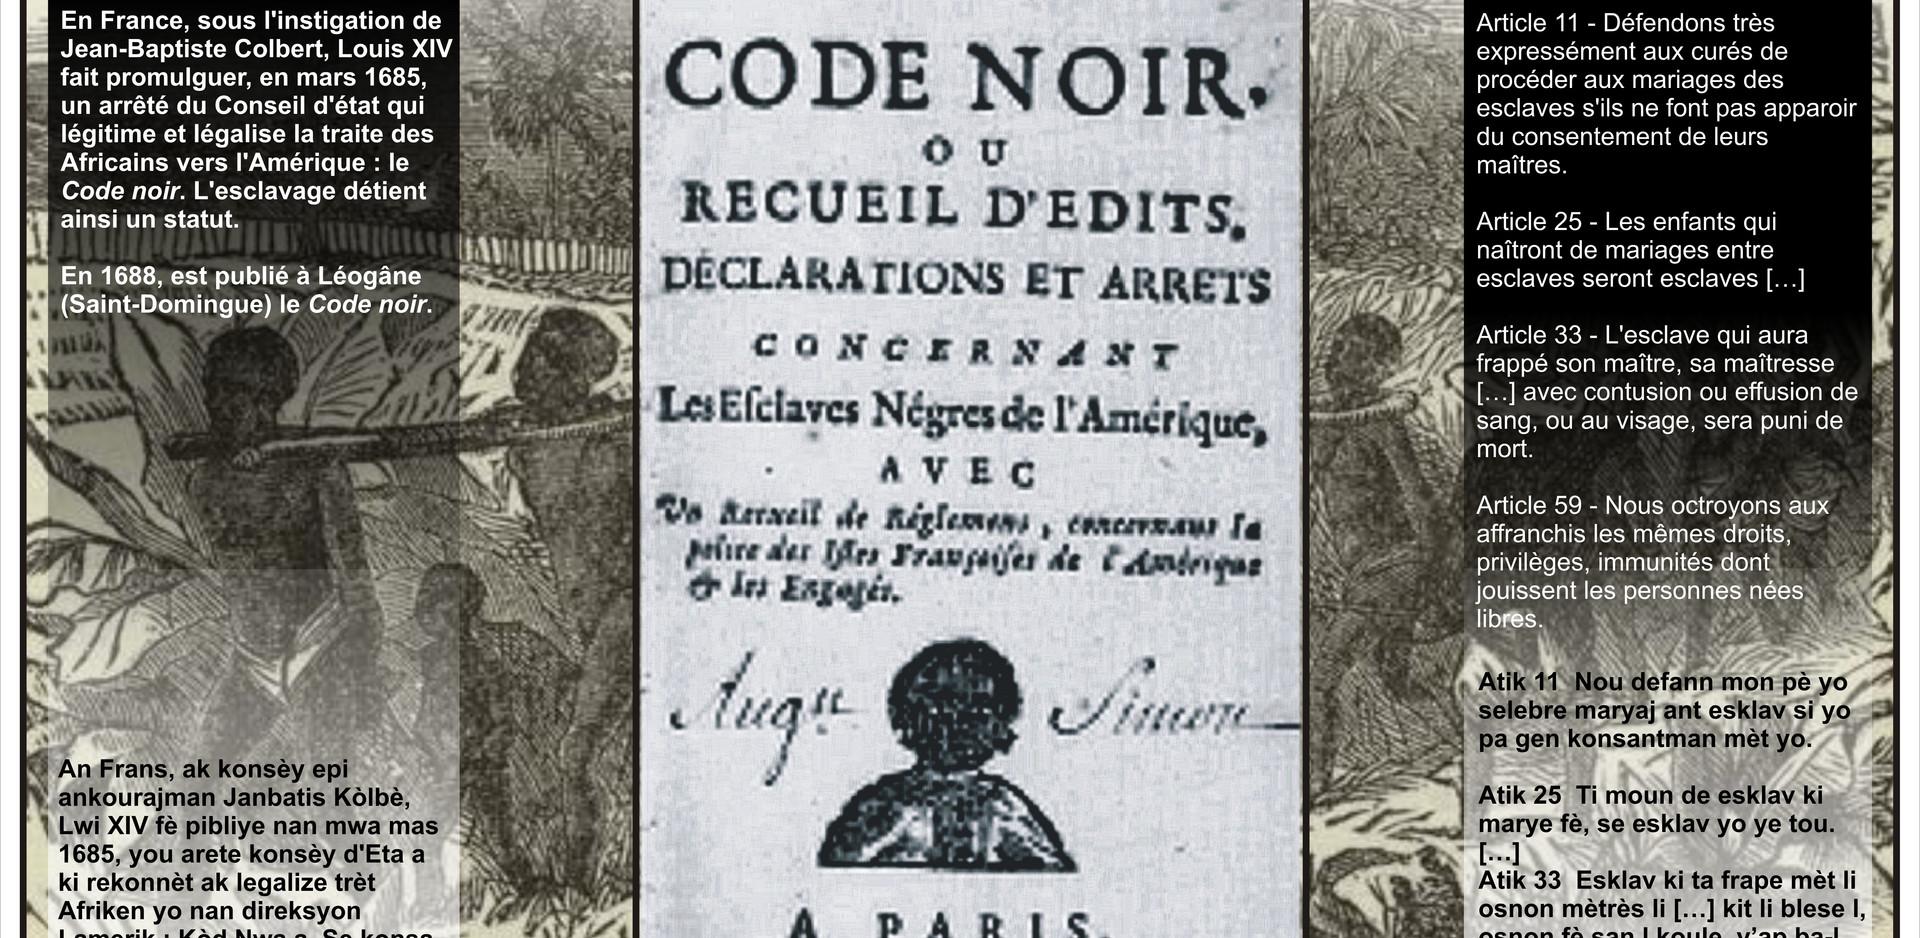 12_code-noir.jpg